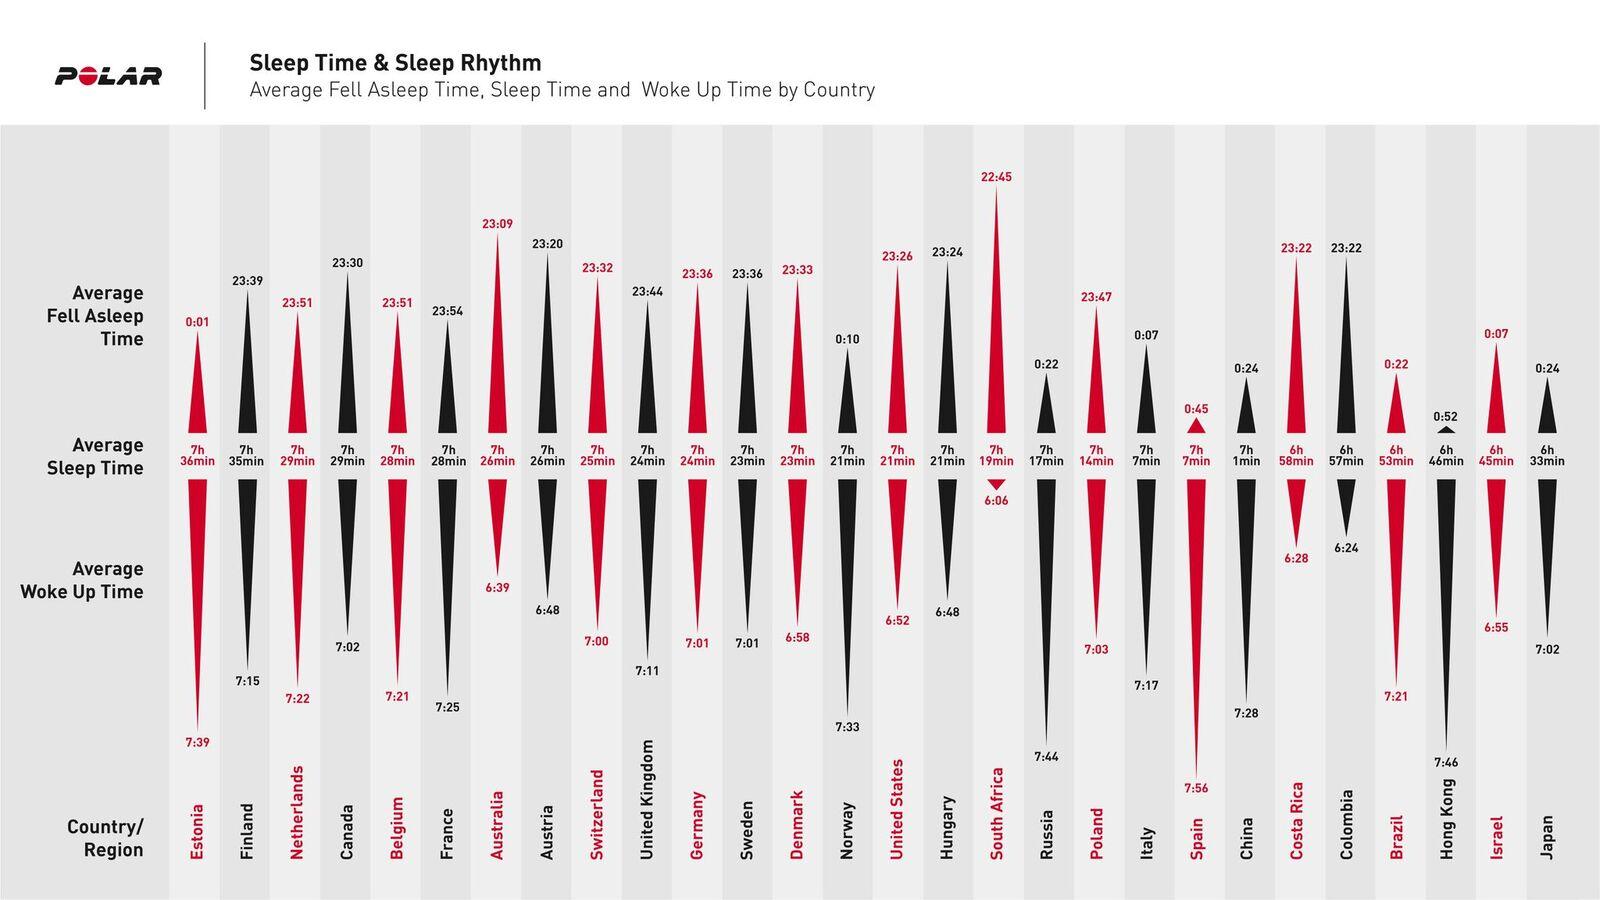 polar reveals sleep habits in 28 countries 1 - Polar reveals sleep habits of men and women in 28 countries